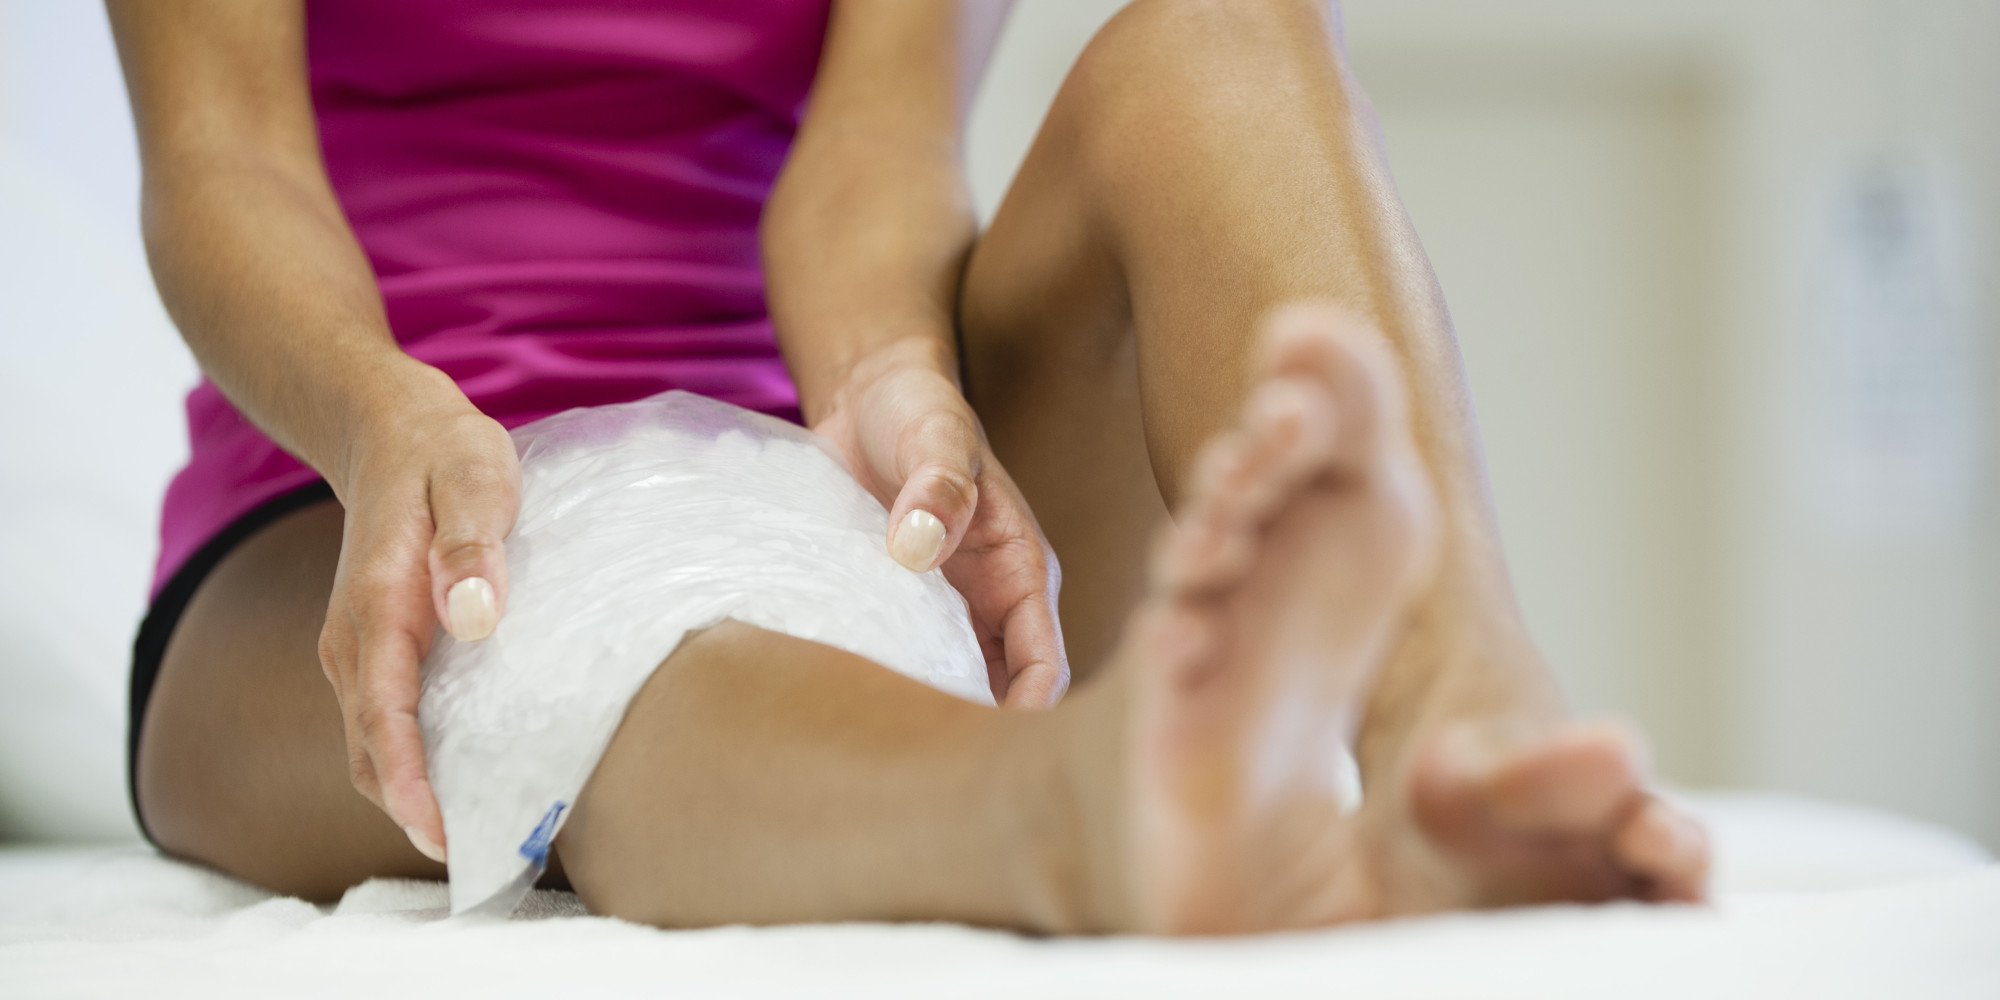 Картинки по запросу Лечение разрыва связок коленного сустава